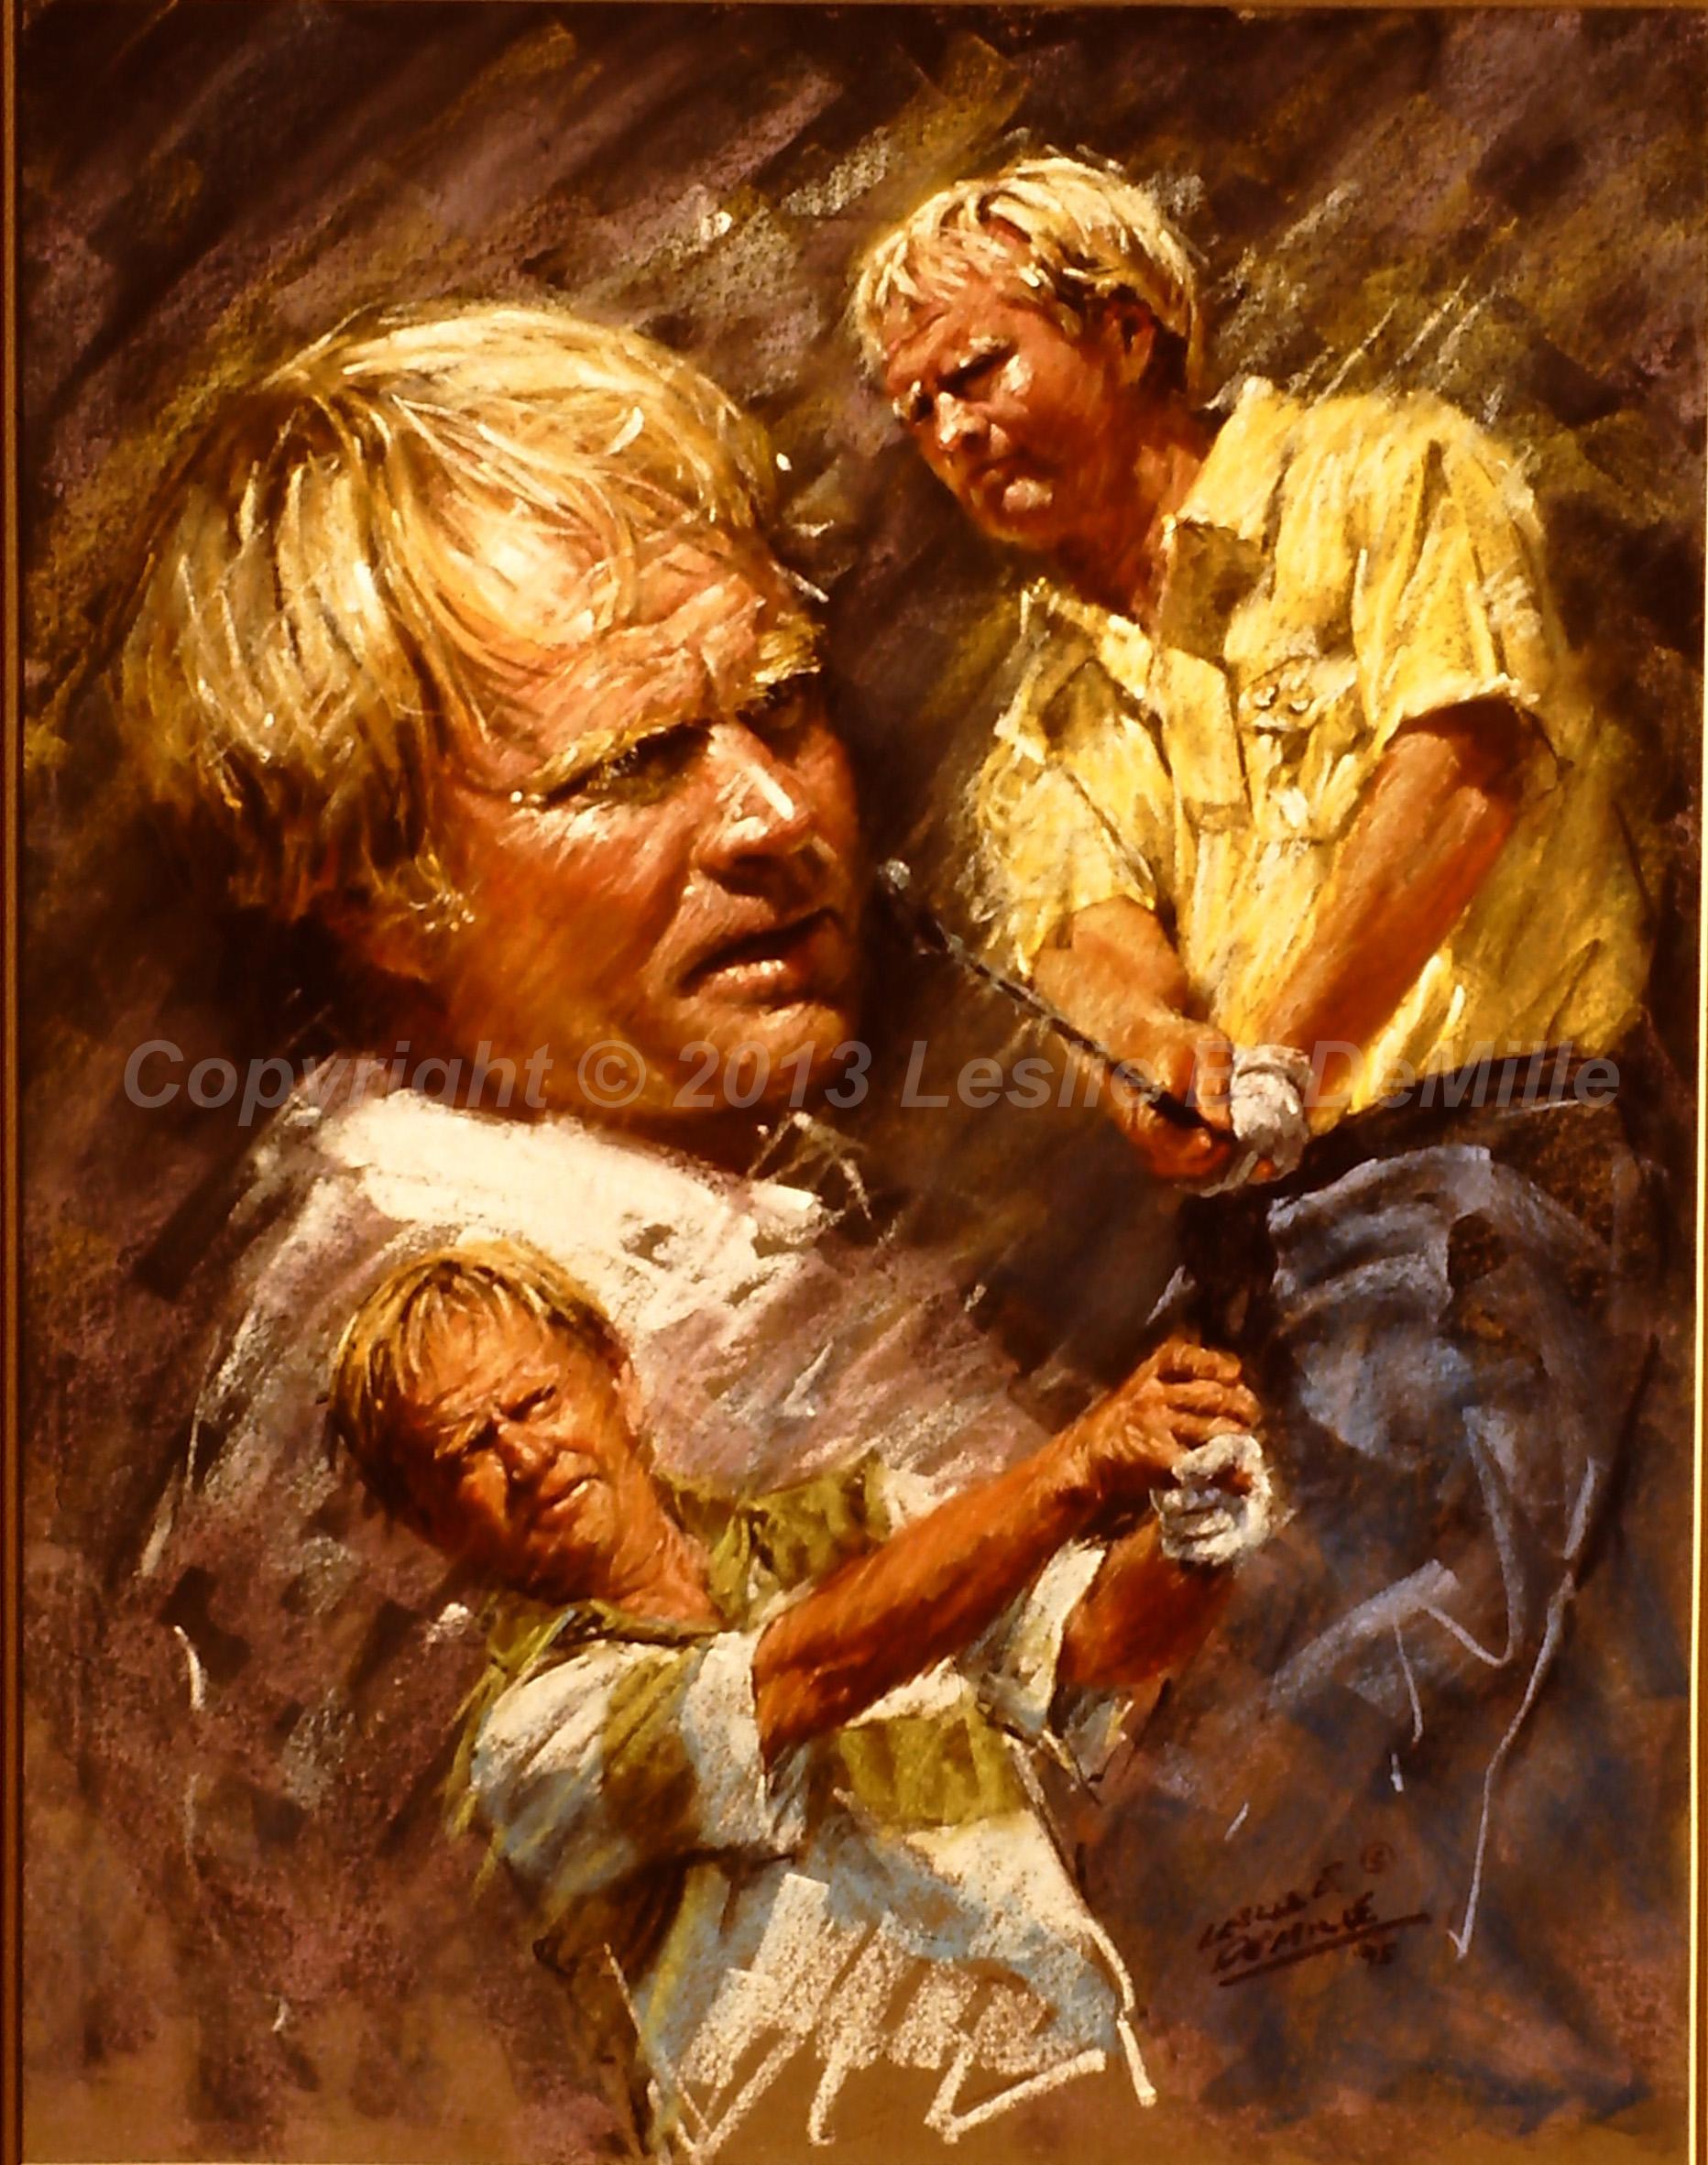 Jack Nicklaus: The Golden Bear, Oil 1994 (11x14)